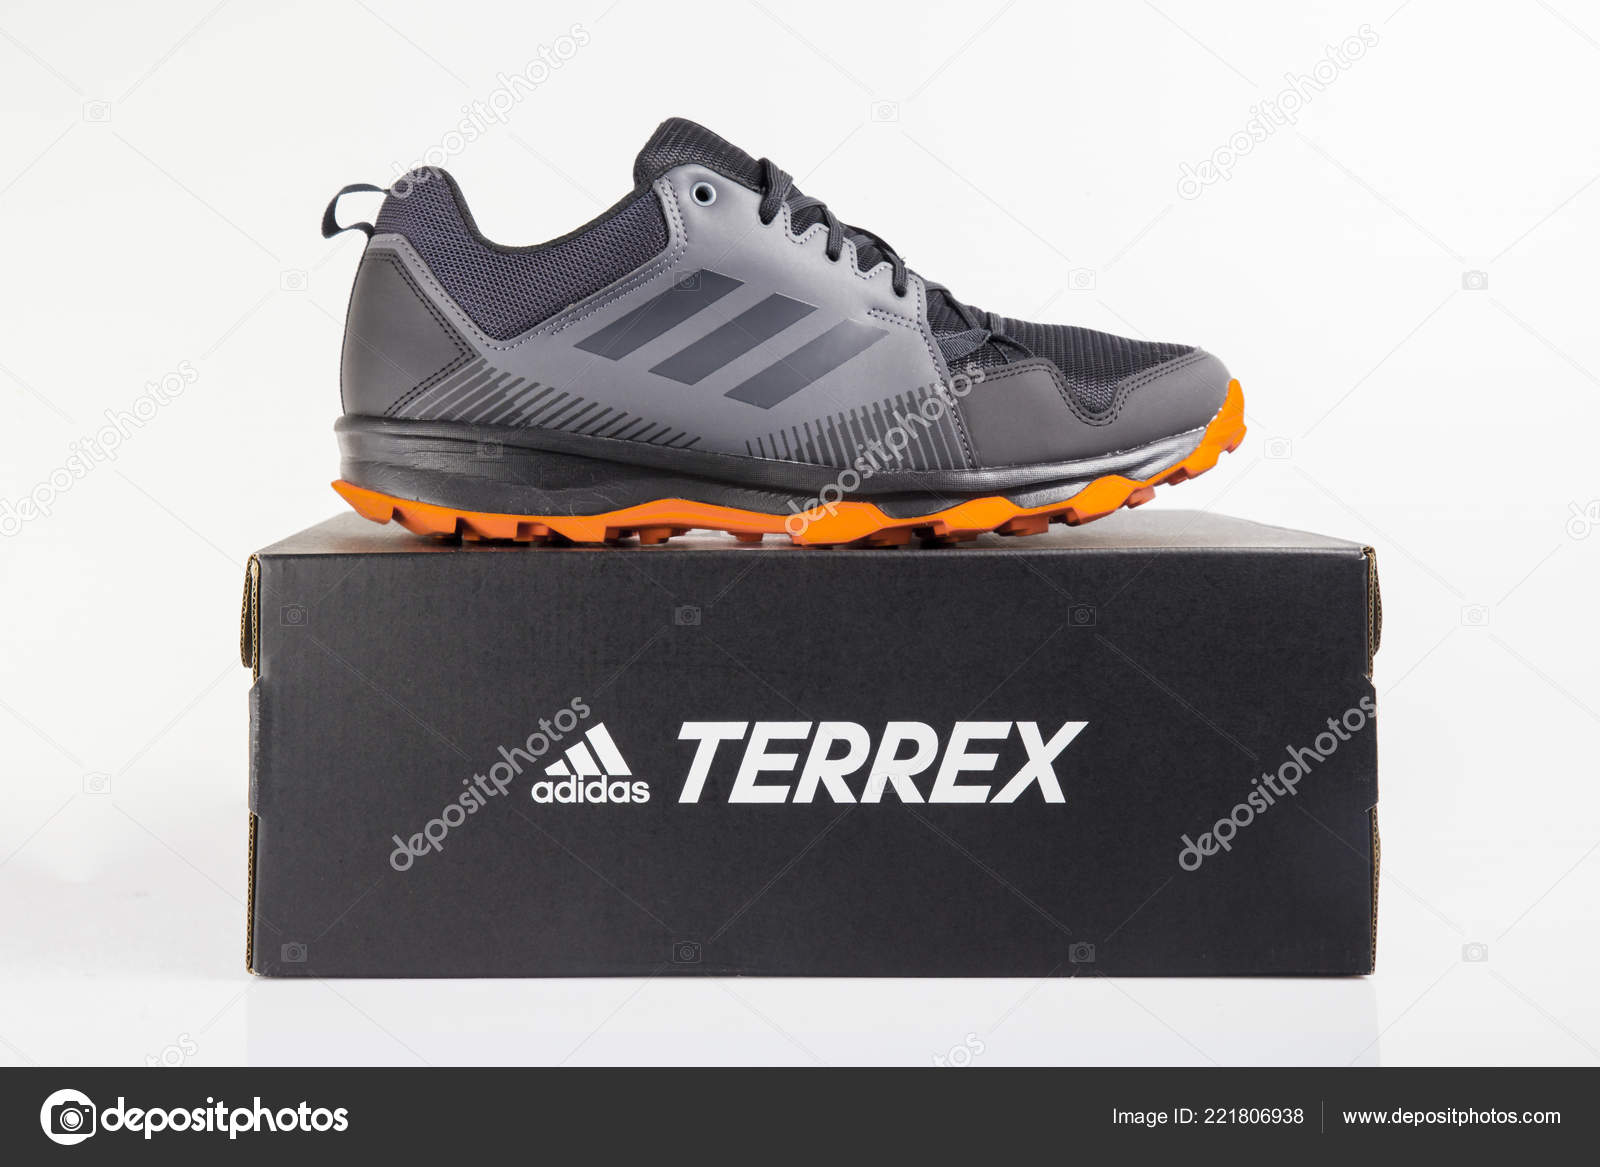 premium selection 78281 3a55d Afife Portugal Oktober 2018 Adidas Running Schuhe Adidas ...